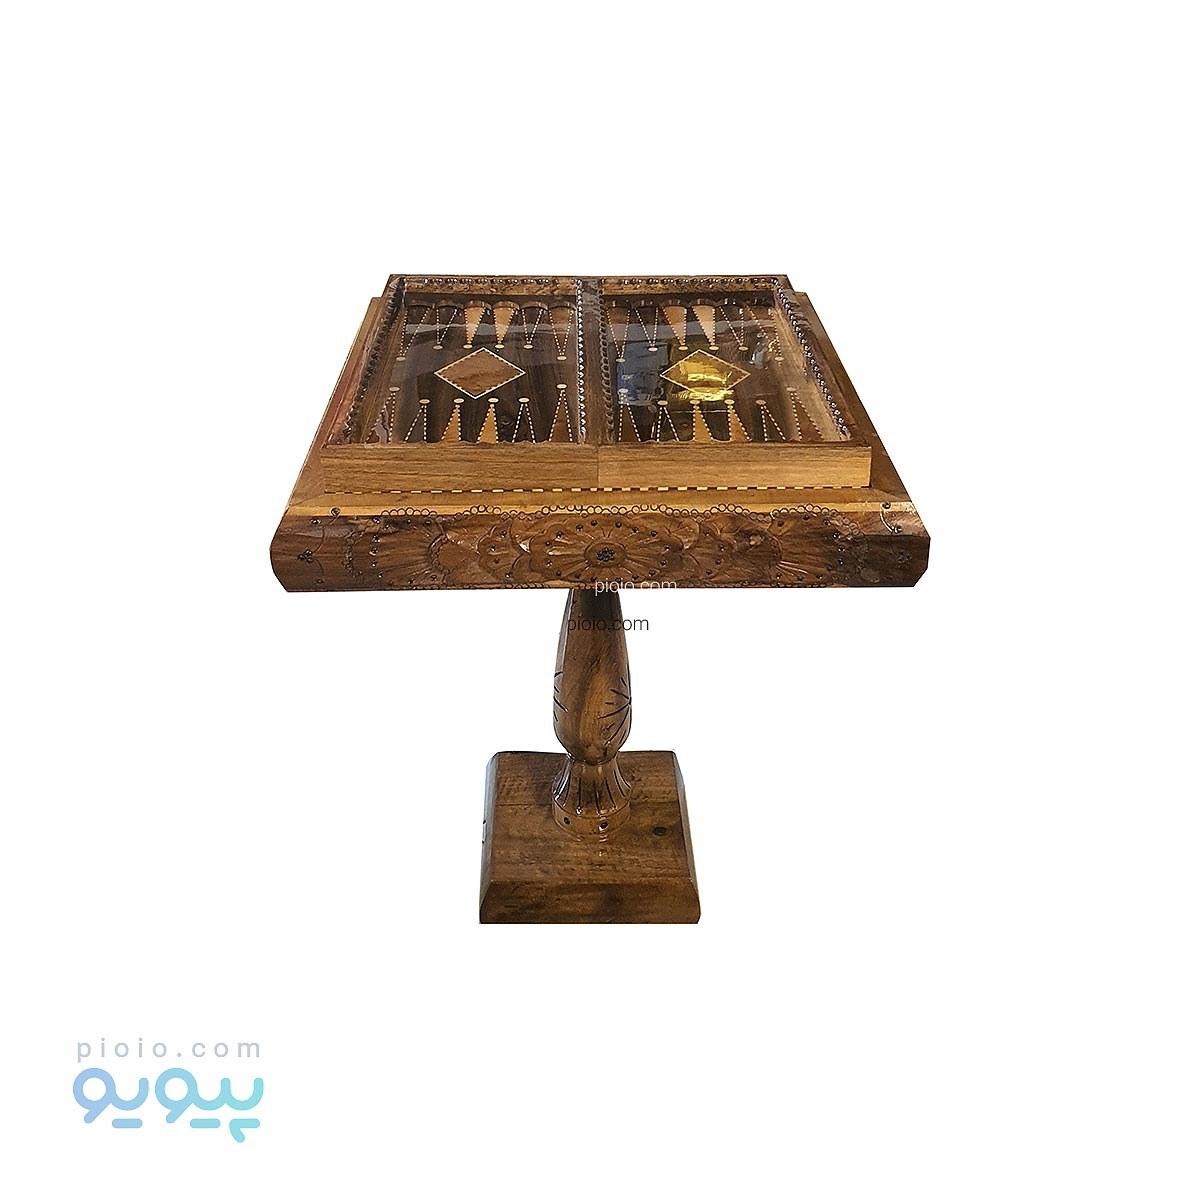 image میز تخته نرد و شطرنج چوب گردو منبت کاری سنندج